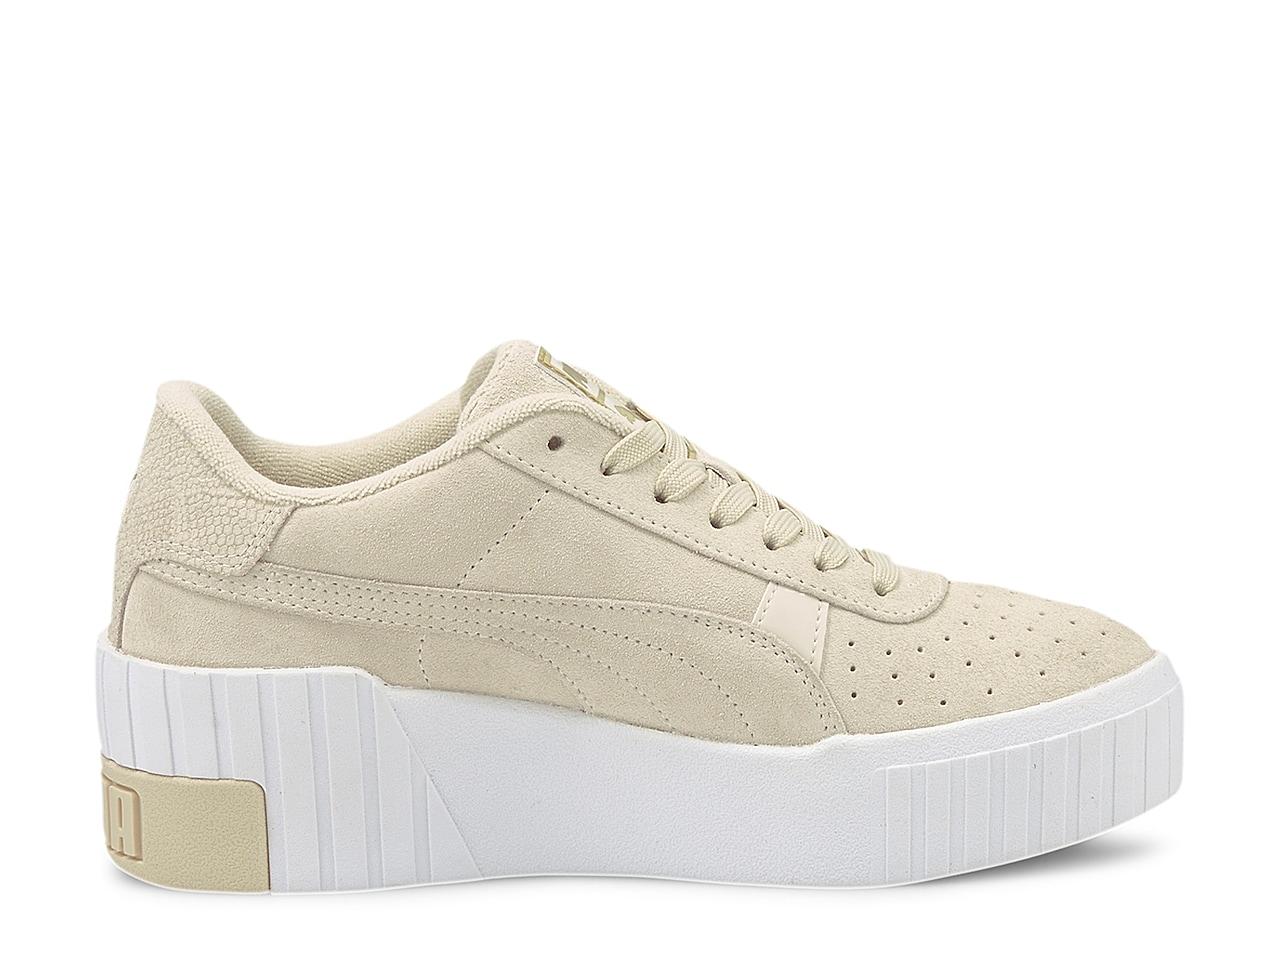 Puma Cali Wedge Sneaker - Women's